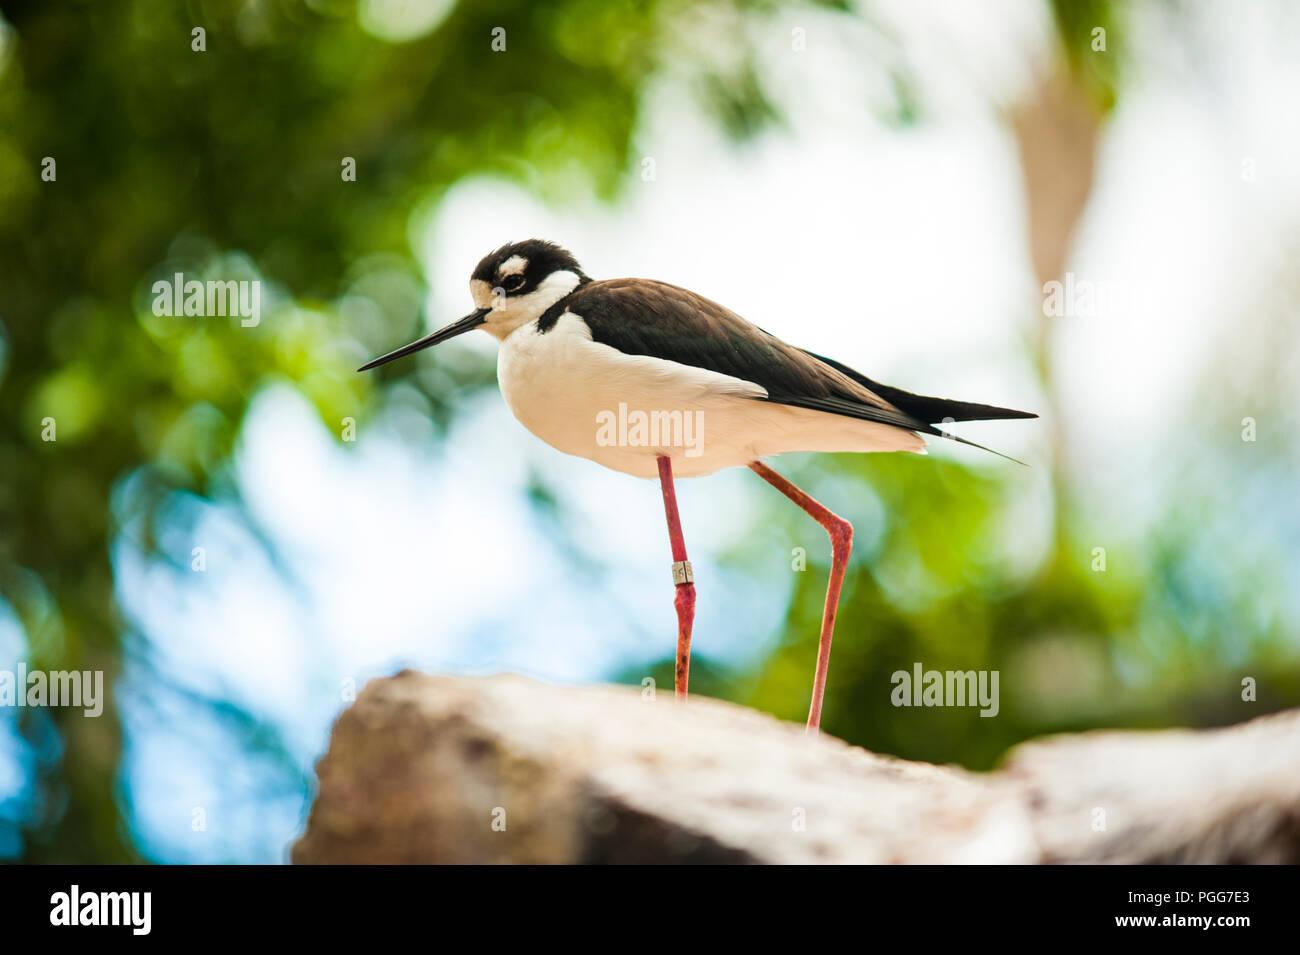 wildlife park - Stock Image